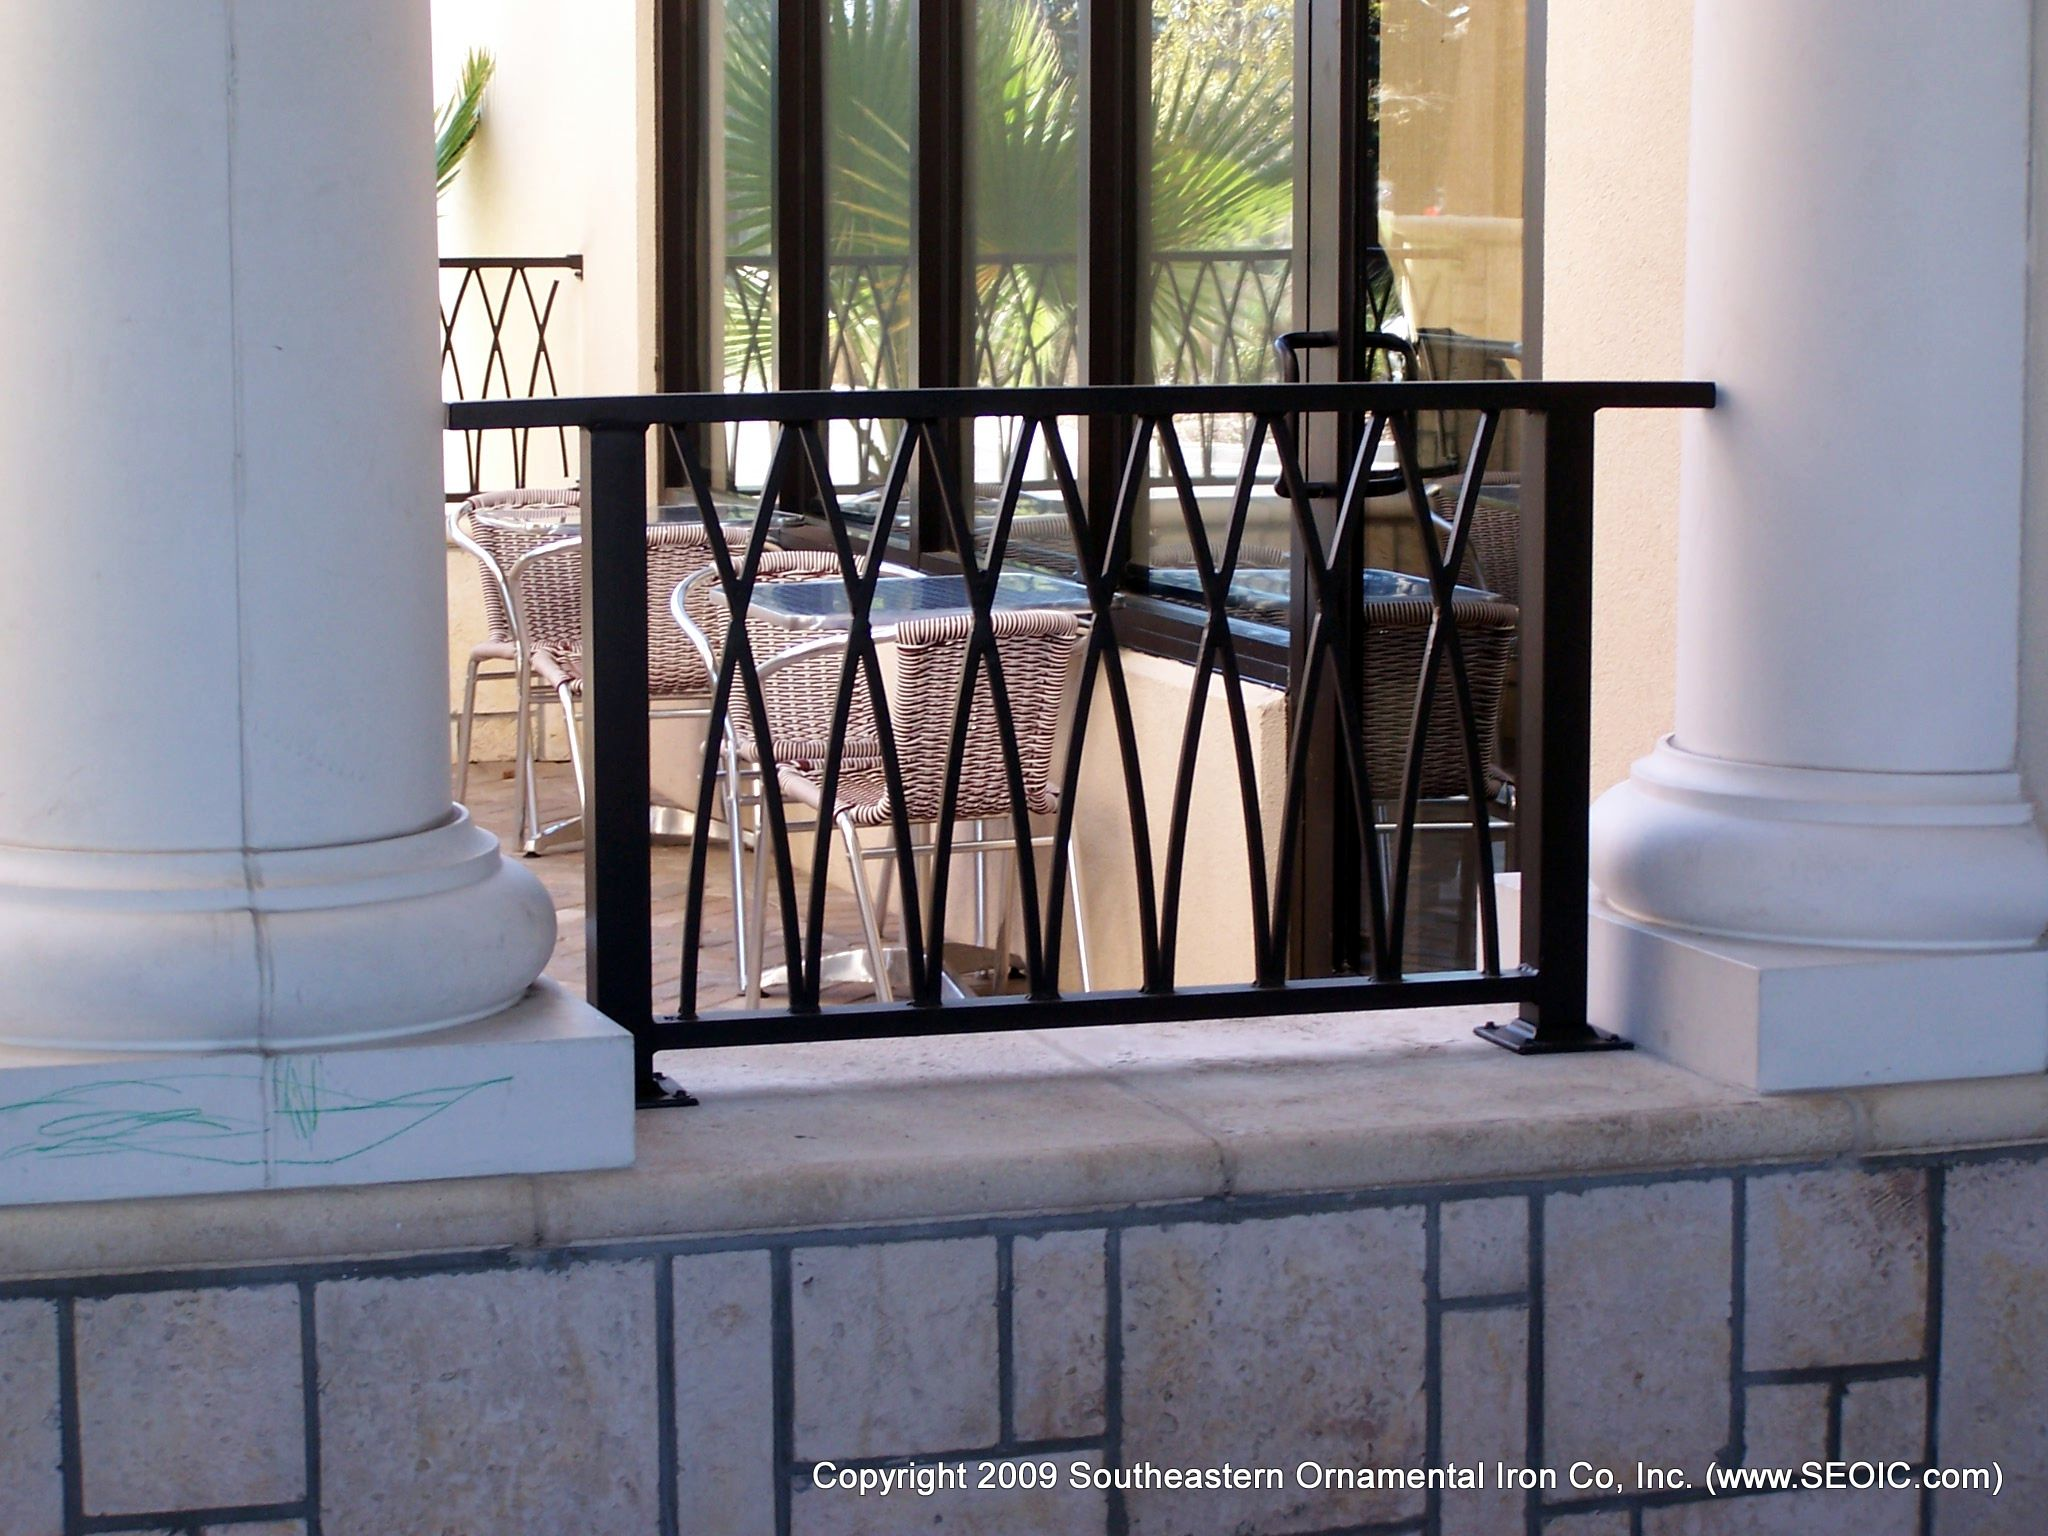 Best Commercial Railing Decorative Art Deco Glass Handicap Fdot 400 x 300